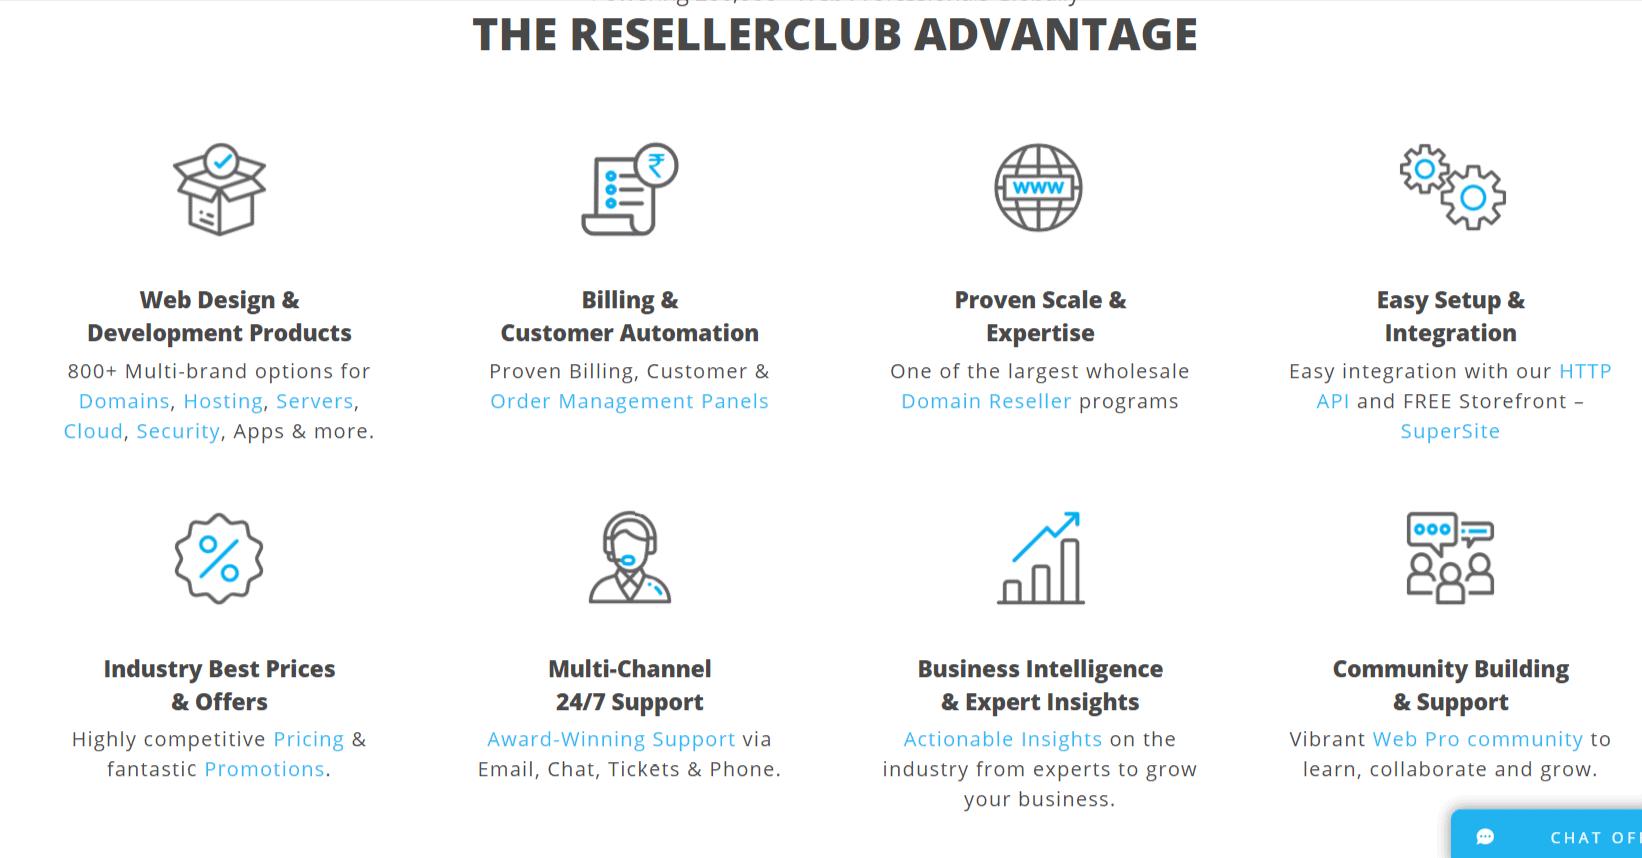 Advantages ResellerClub